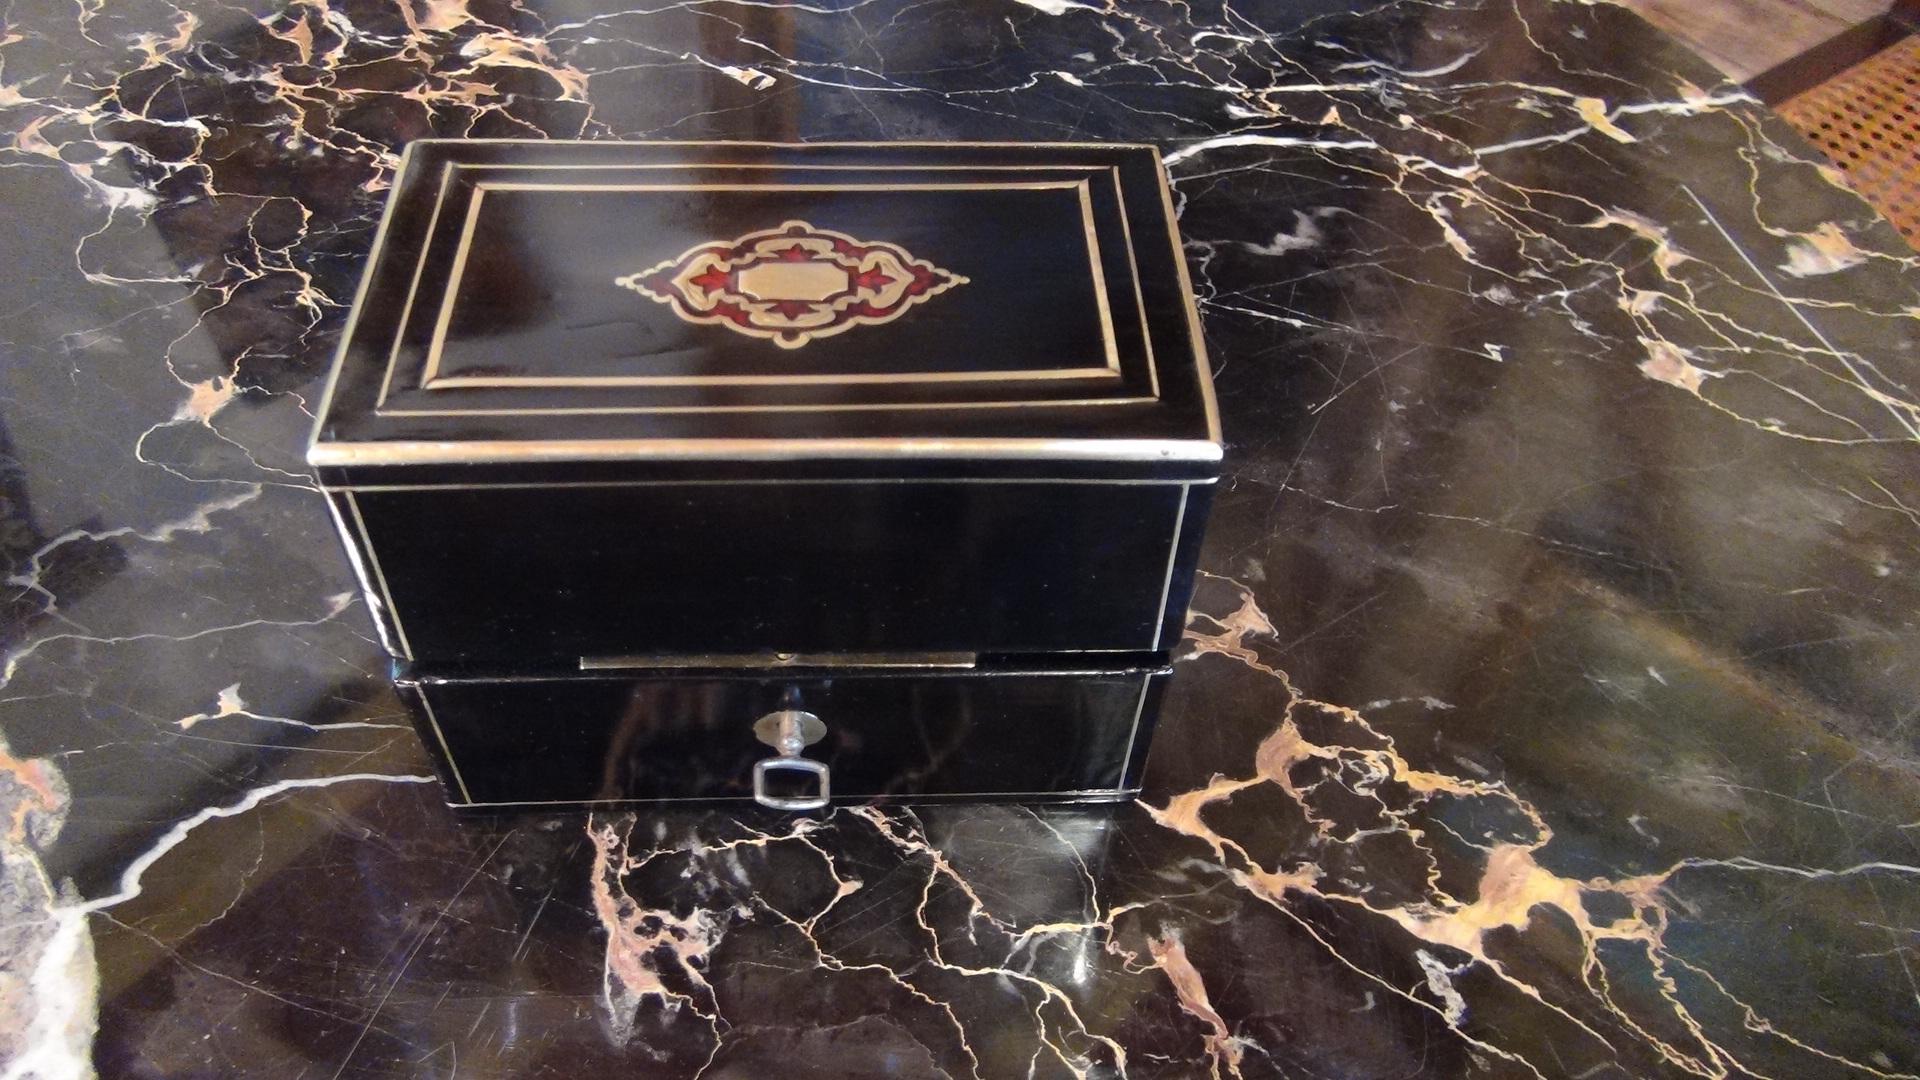 coffret senteur napol on iii duchaylat antiquit s. Black Bedroom Furniture Sets. Home Design Ideas